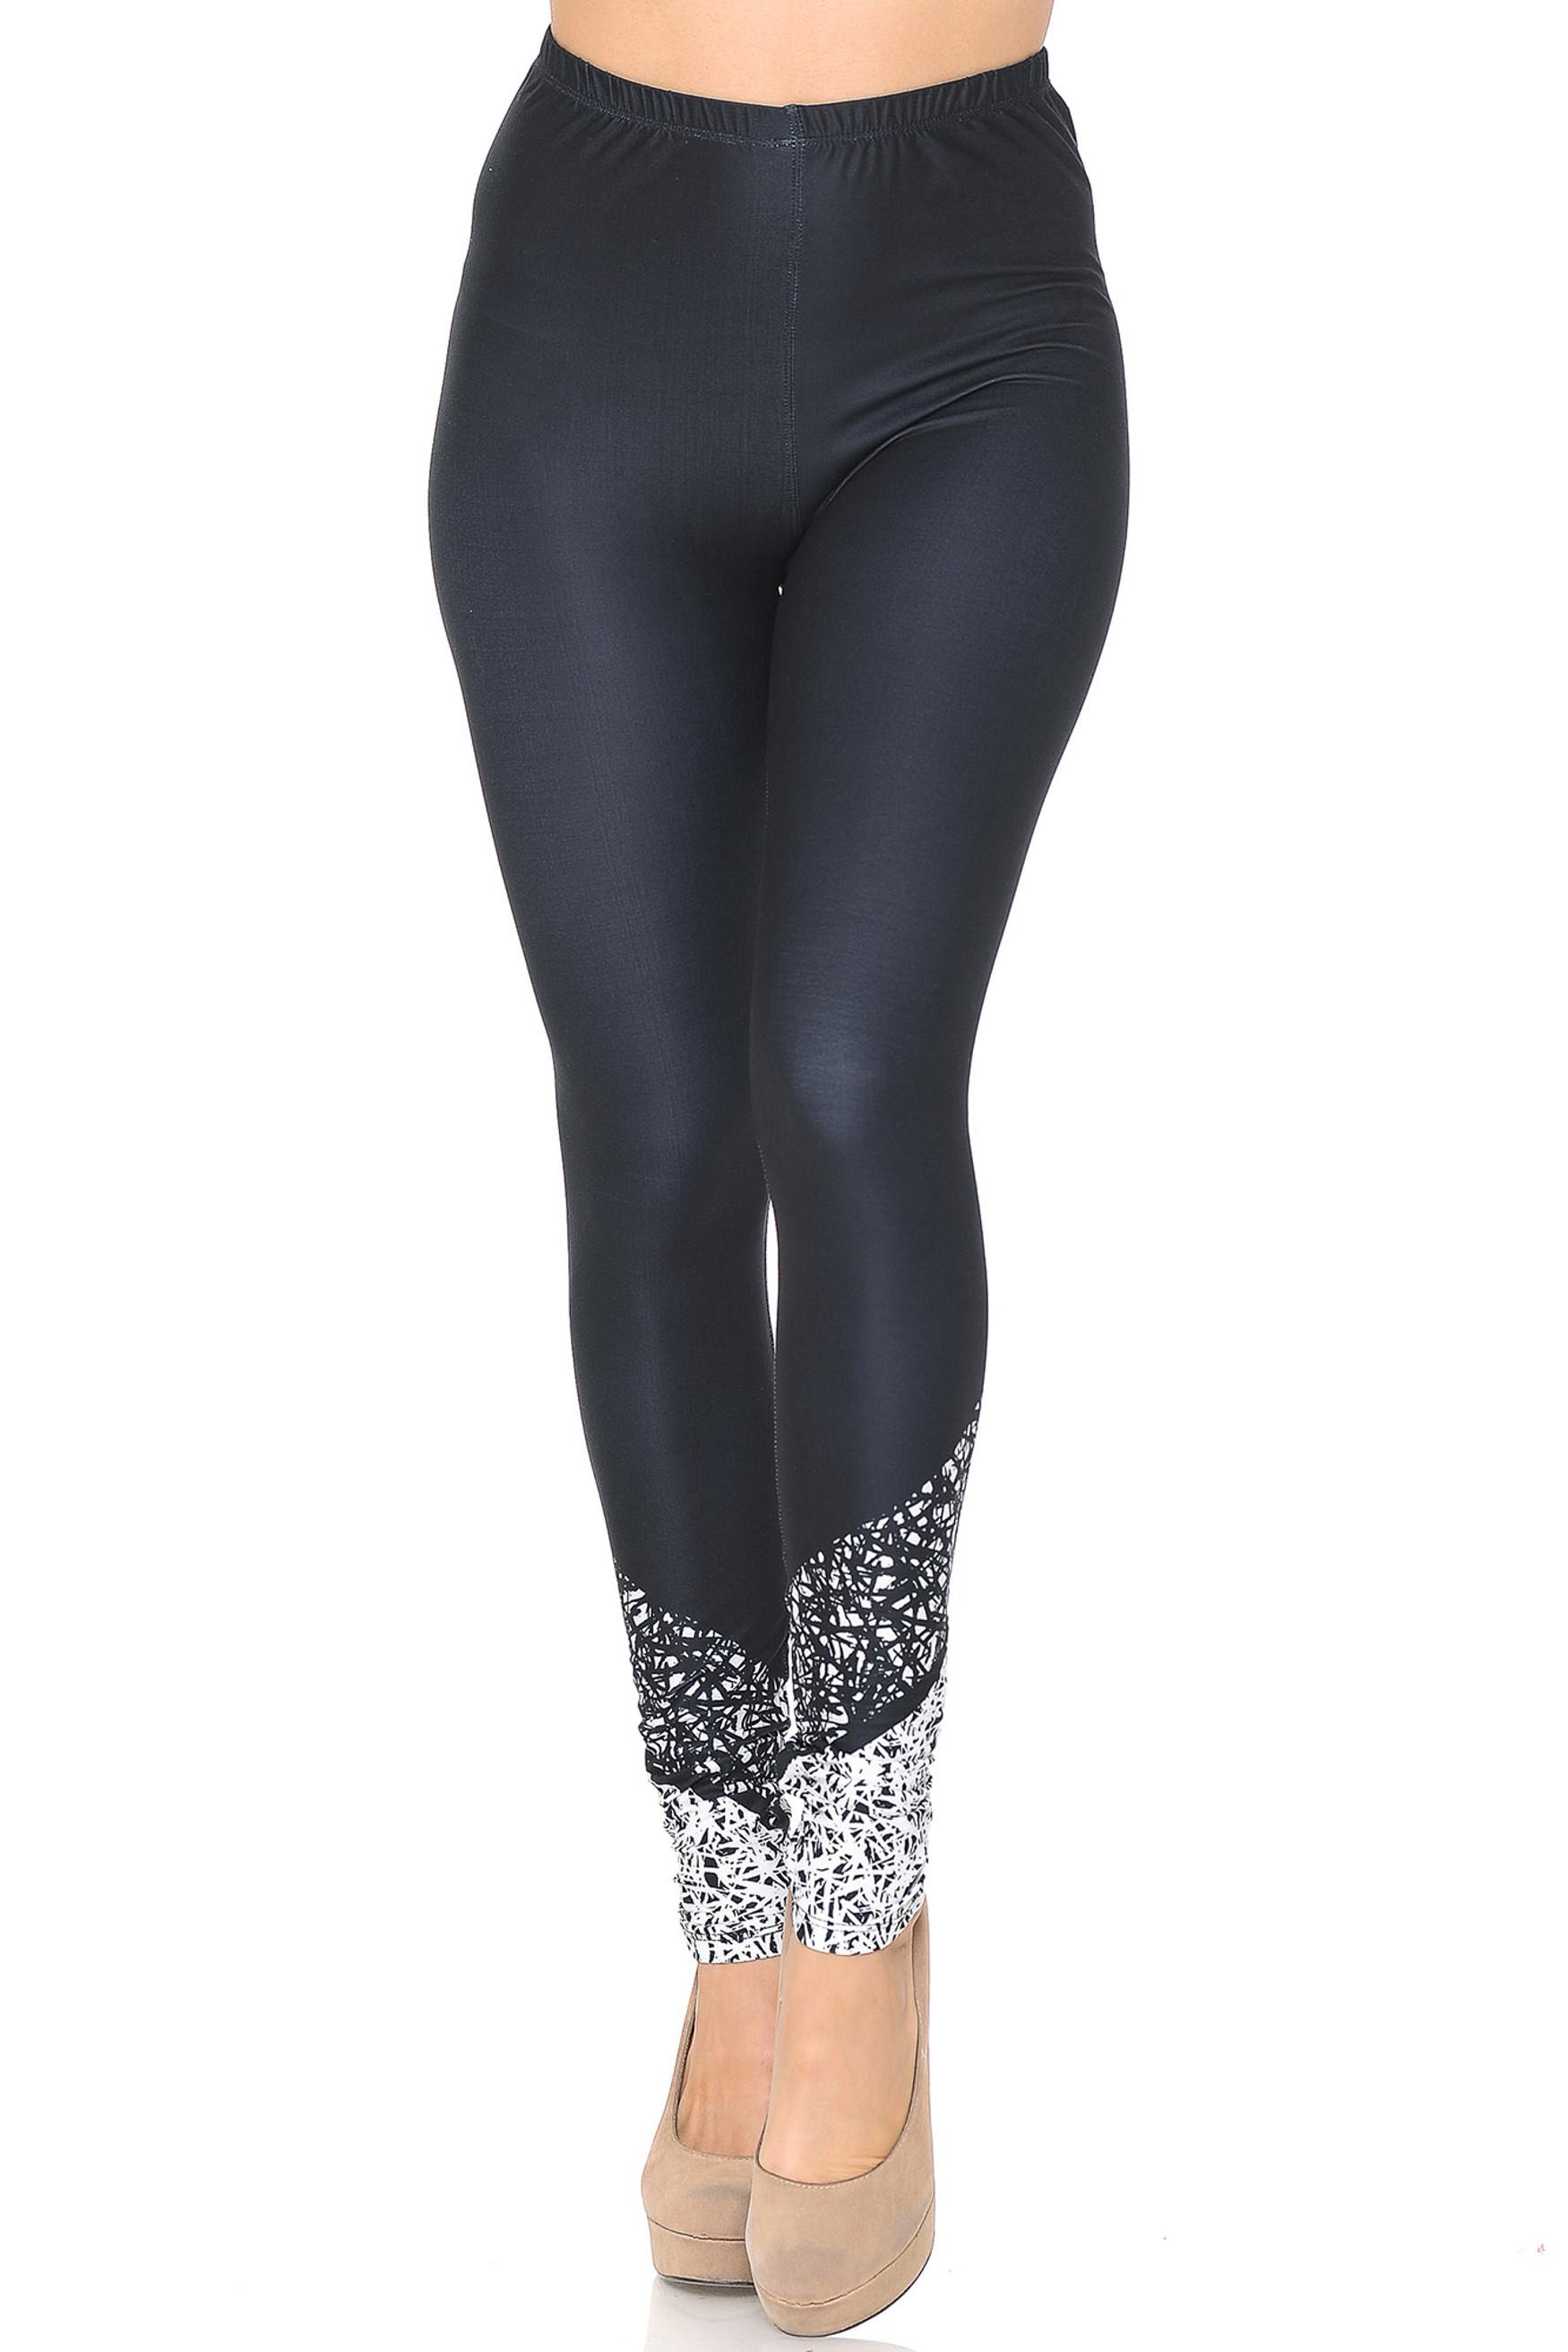 Creamy Soft Ebony Escapade Leggings - USA Fashion™